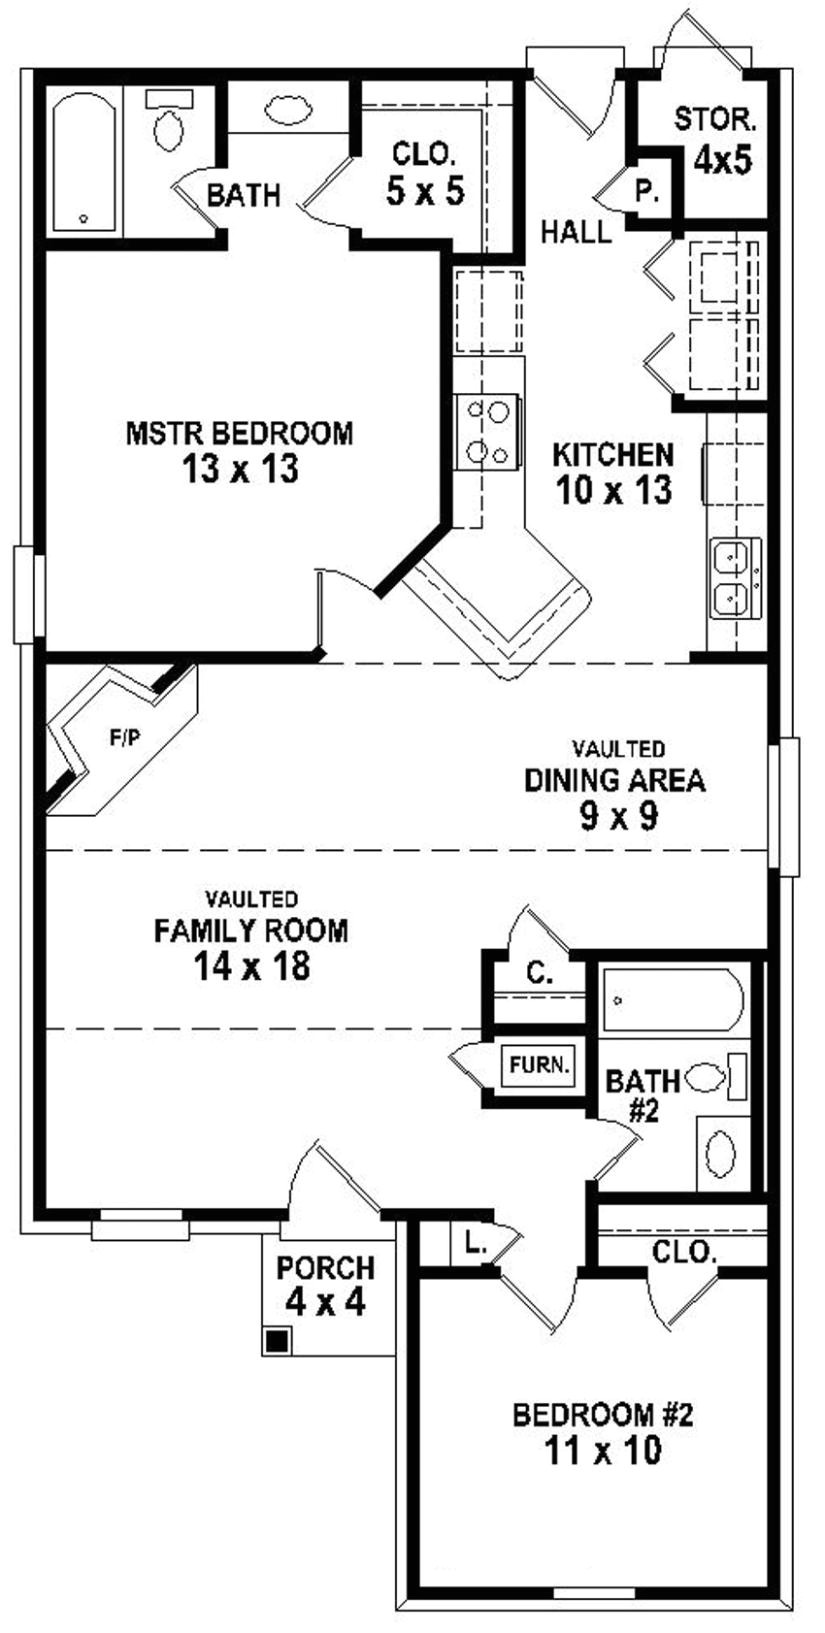 654334 simple 2 bedroom 2 bath house plan